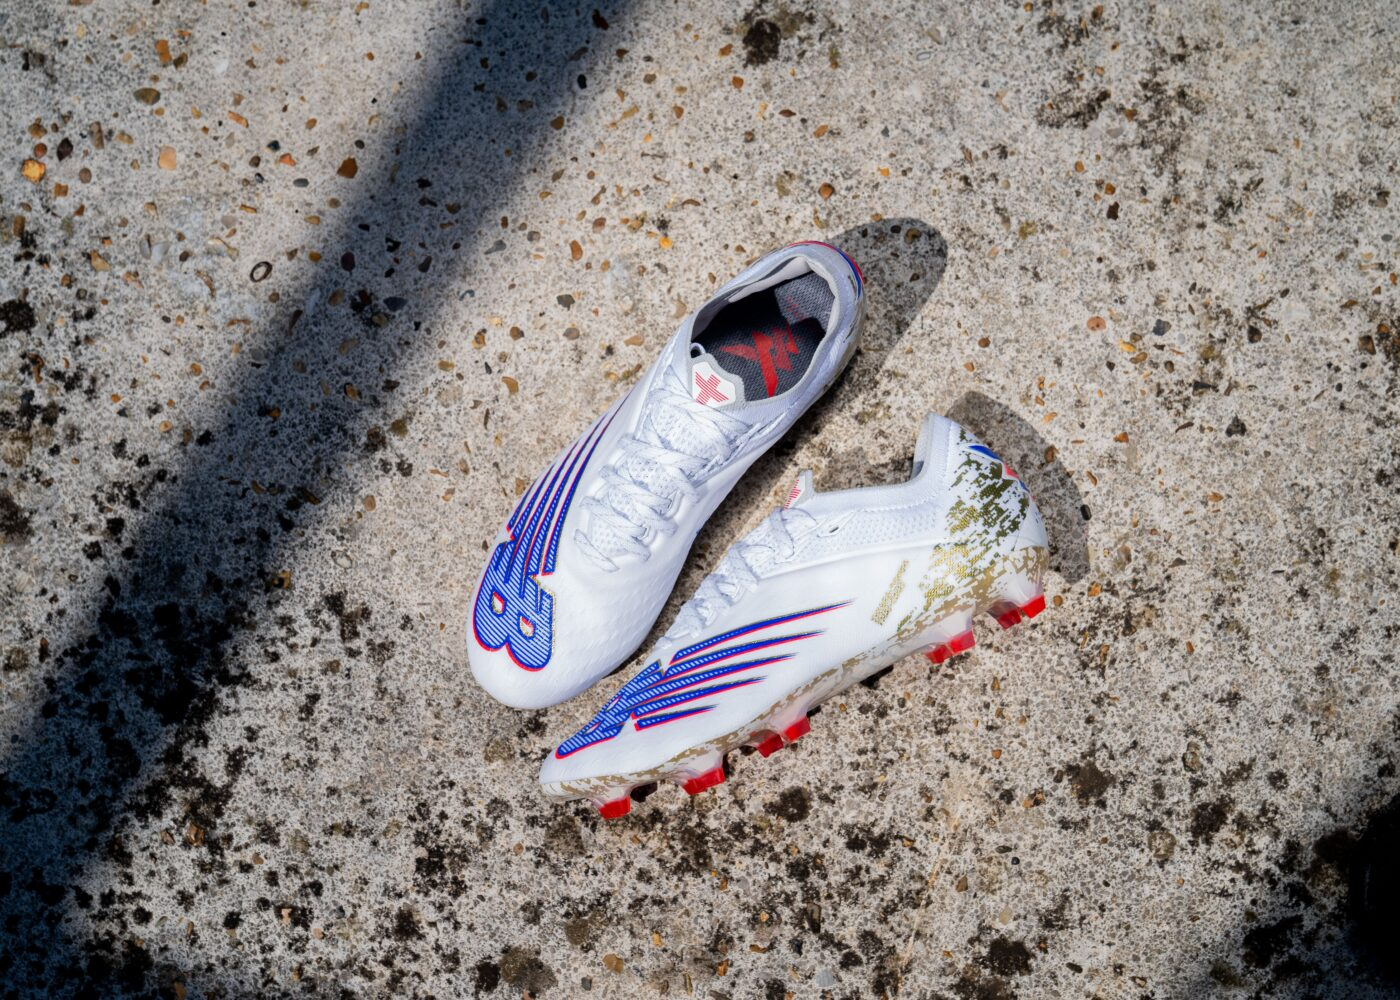 Chaussures Raheem Sterling EURO 2020 - New Balance